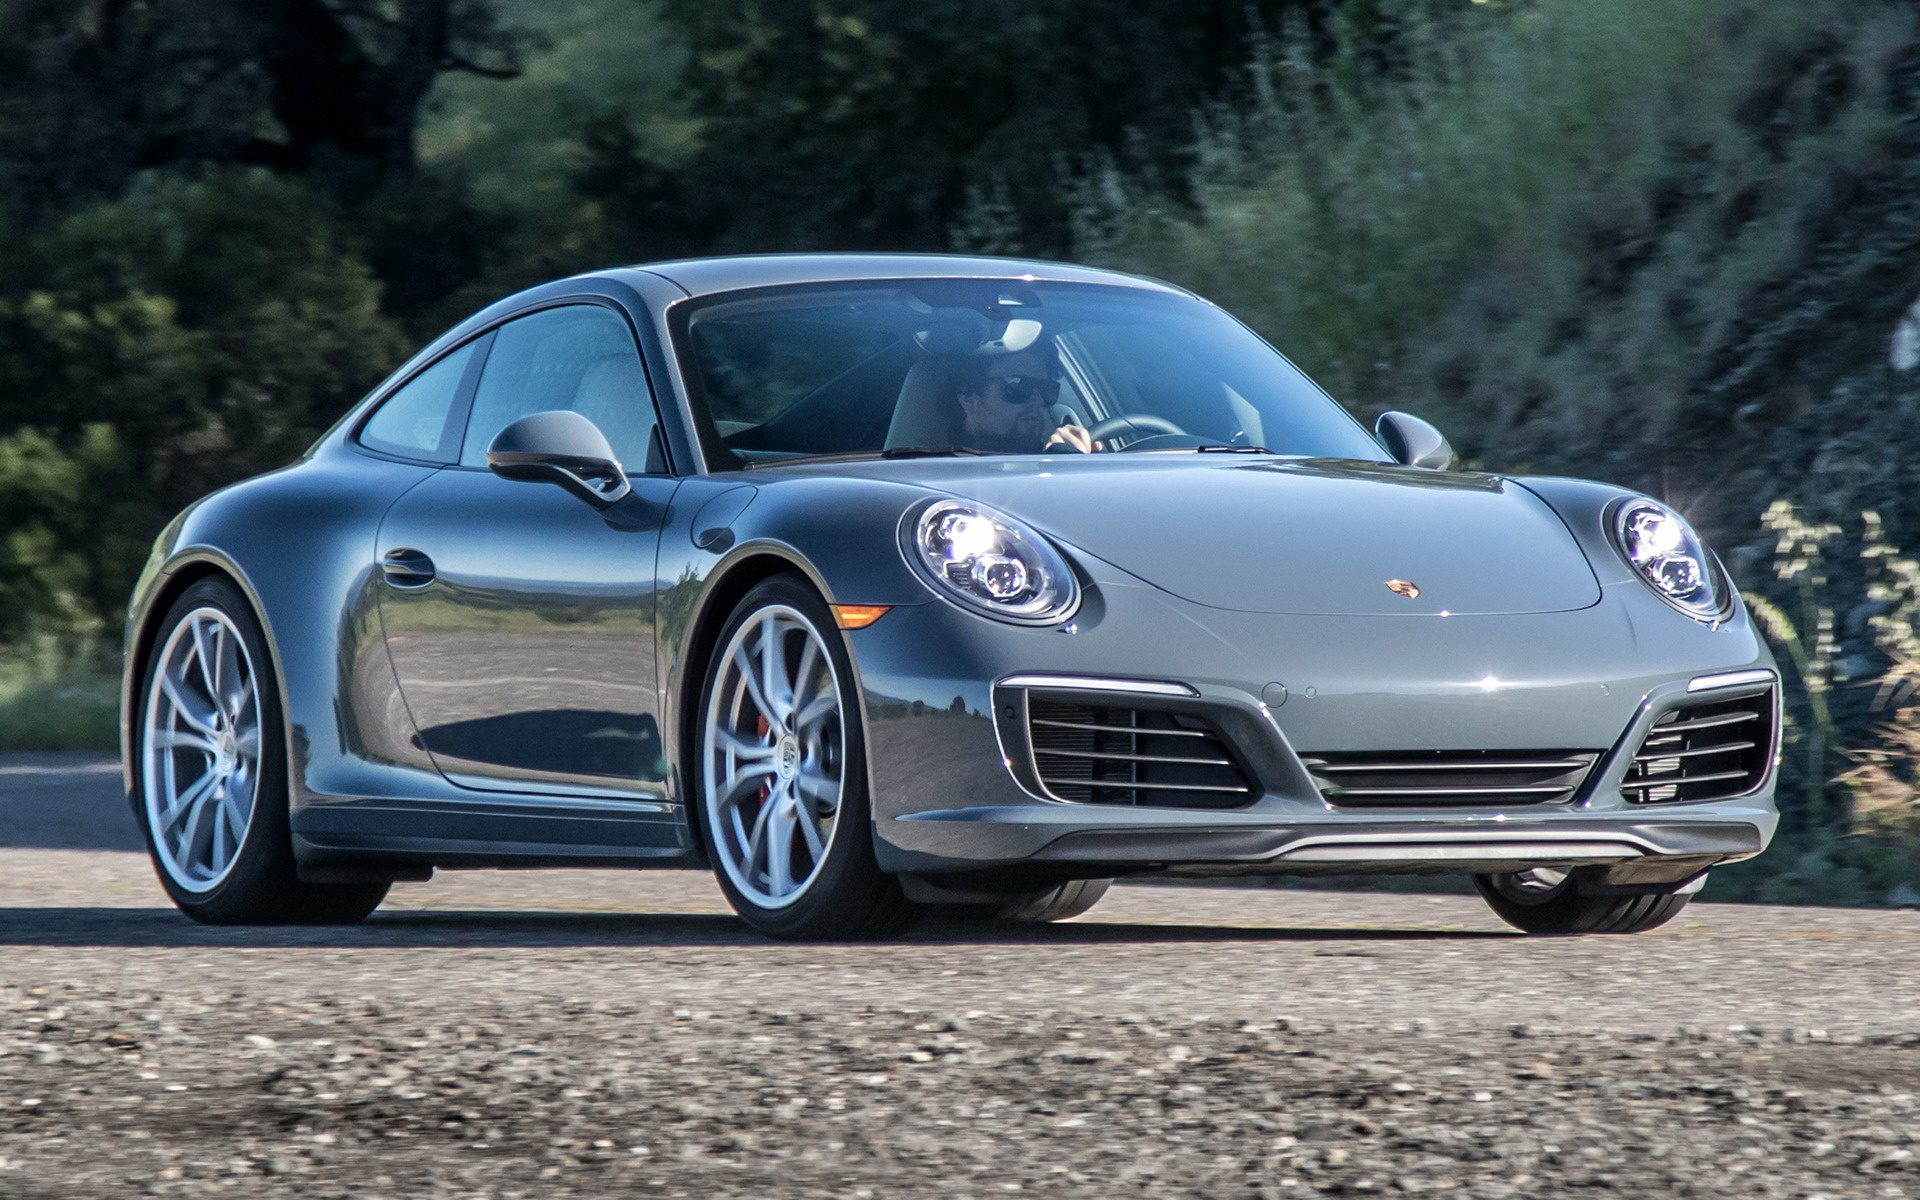 2017 Porsche 911 Carrera S US   Wallpapers and HD Images Car Pixel 1920x1200